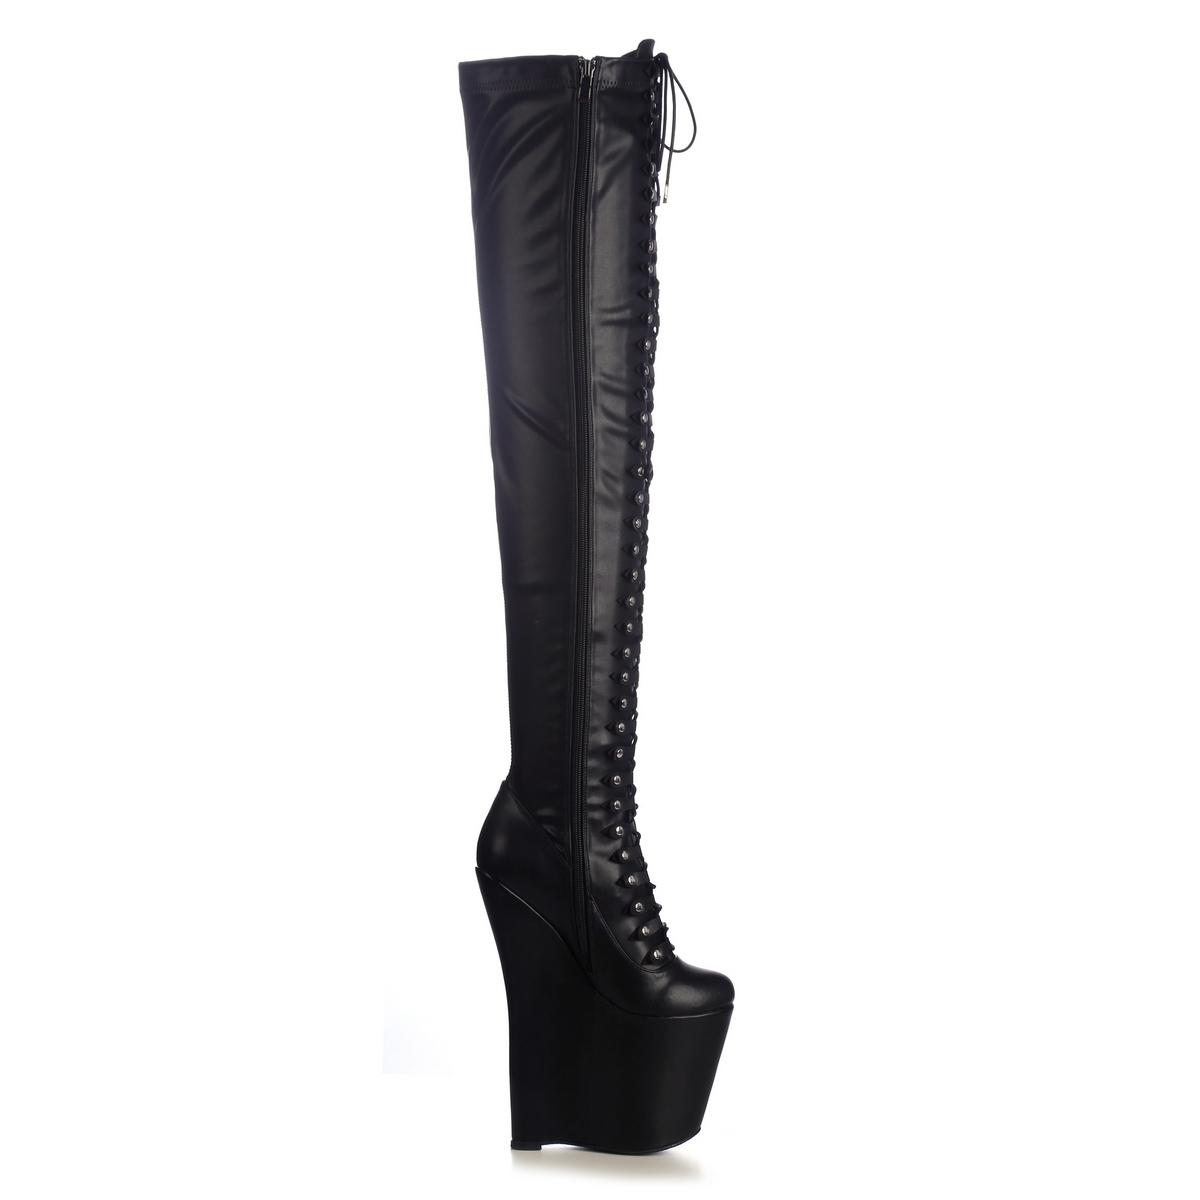 Giaro Mistery 1005 Overknee Stiefel in Übergrößen Schwarz große Damenschuhe – Bild 4